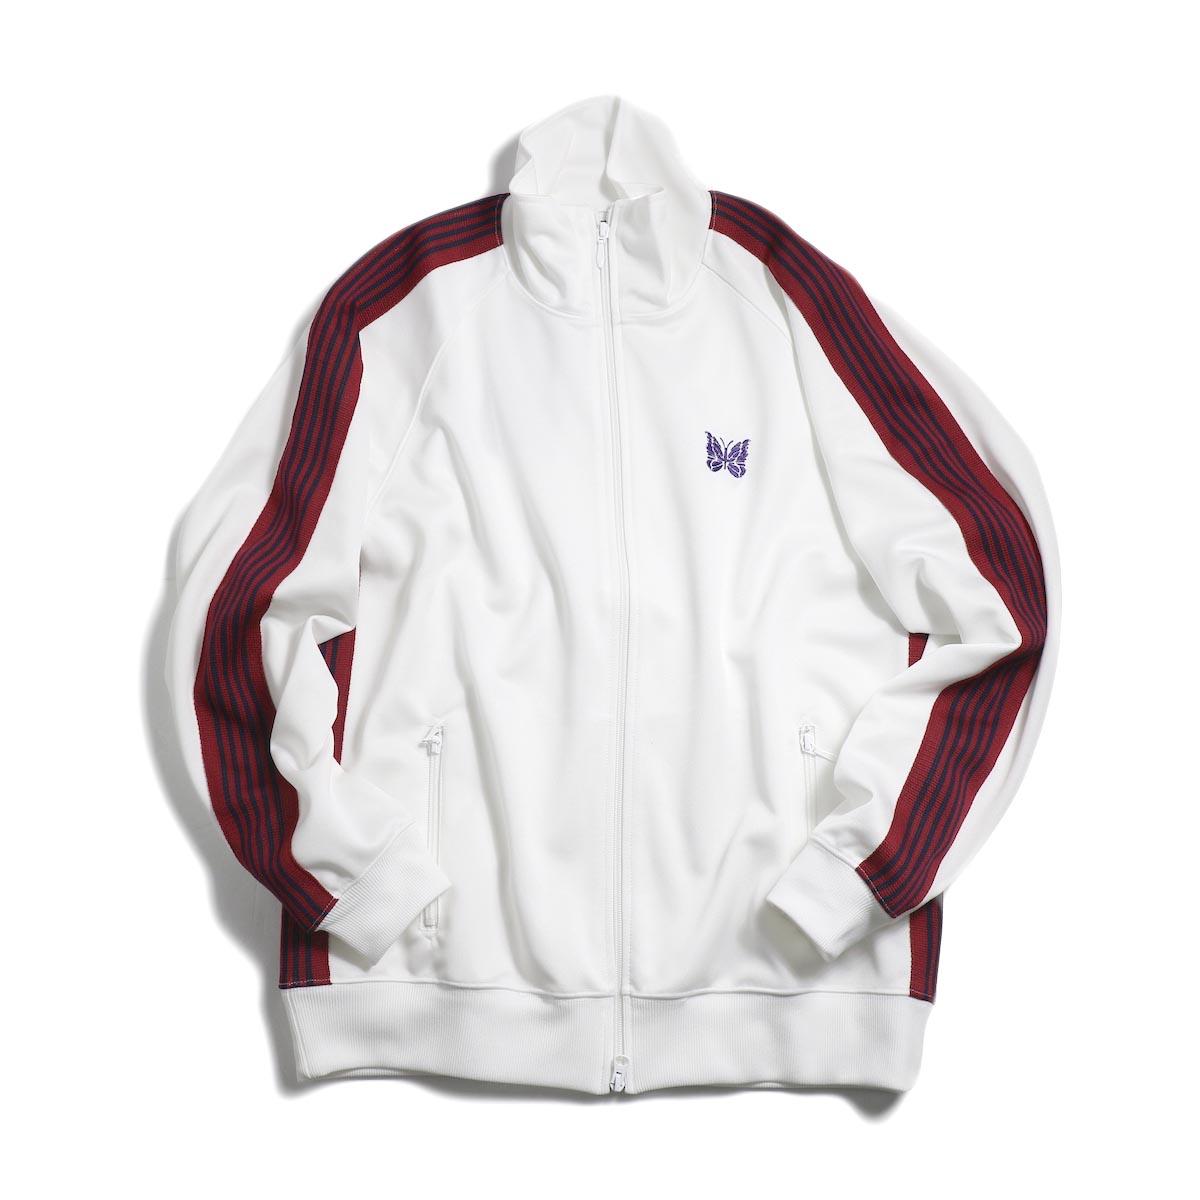 Needles / Track Jacket - Poly Smooth (White)